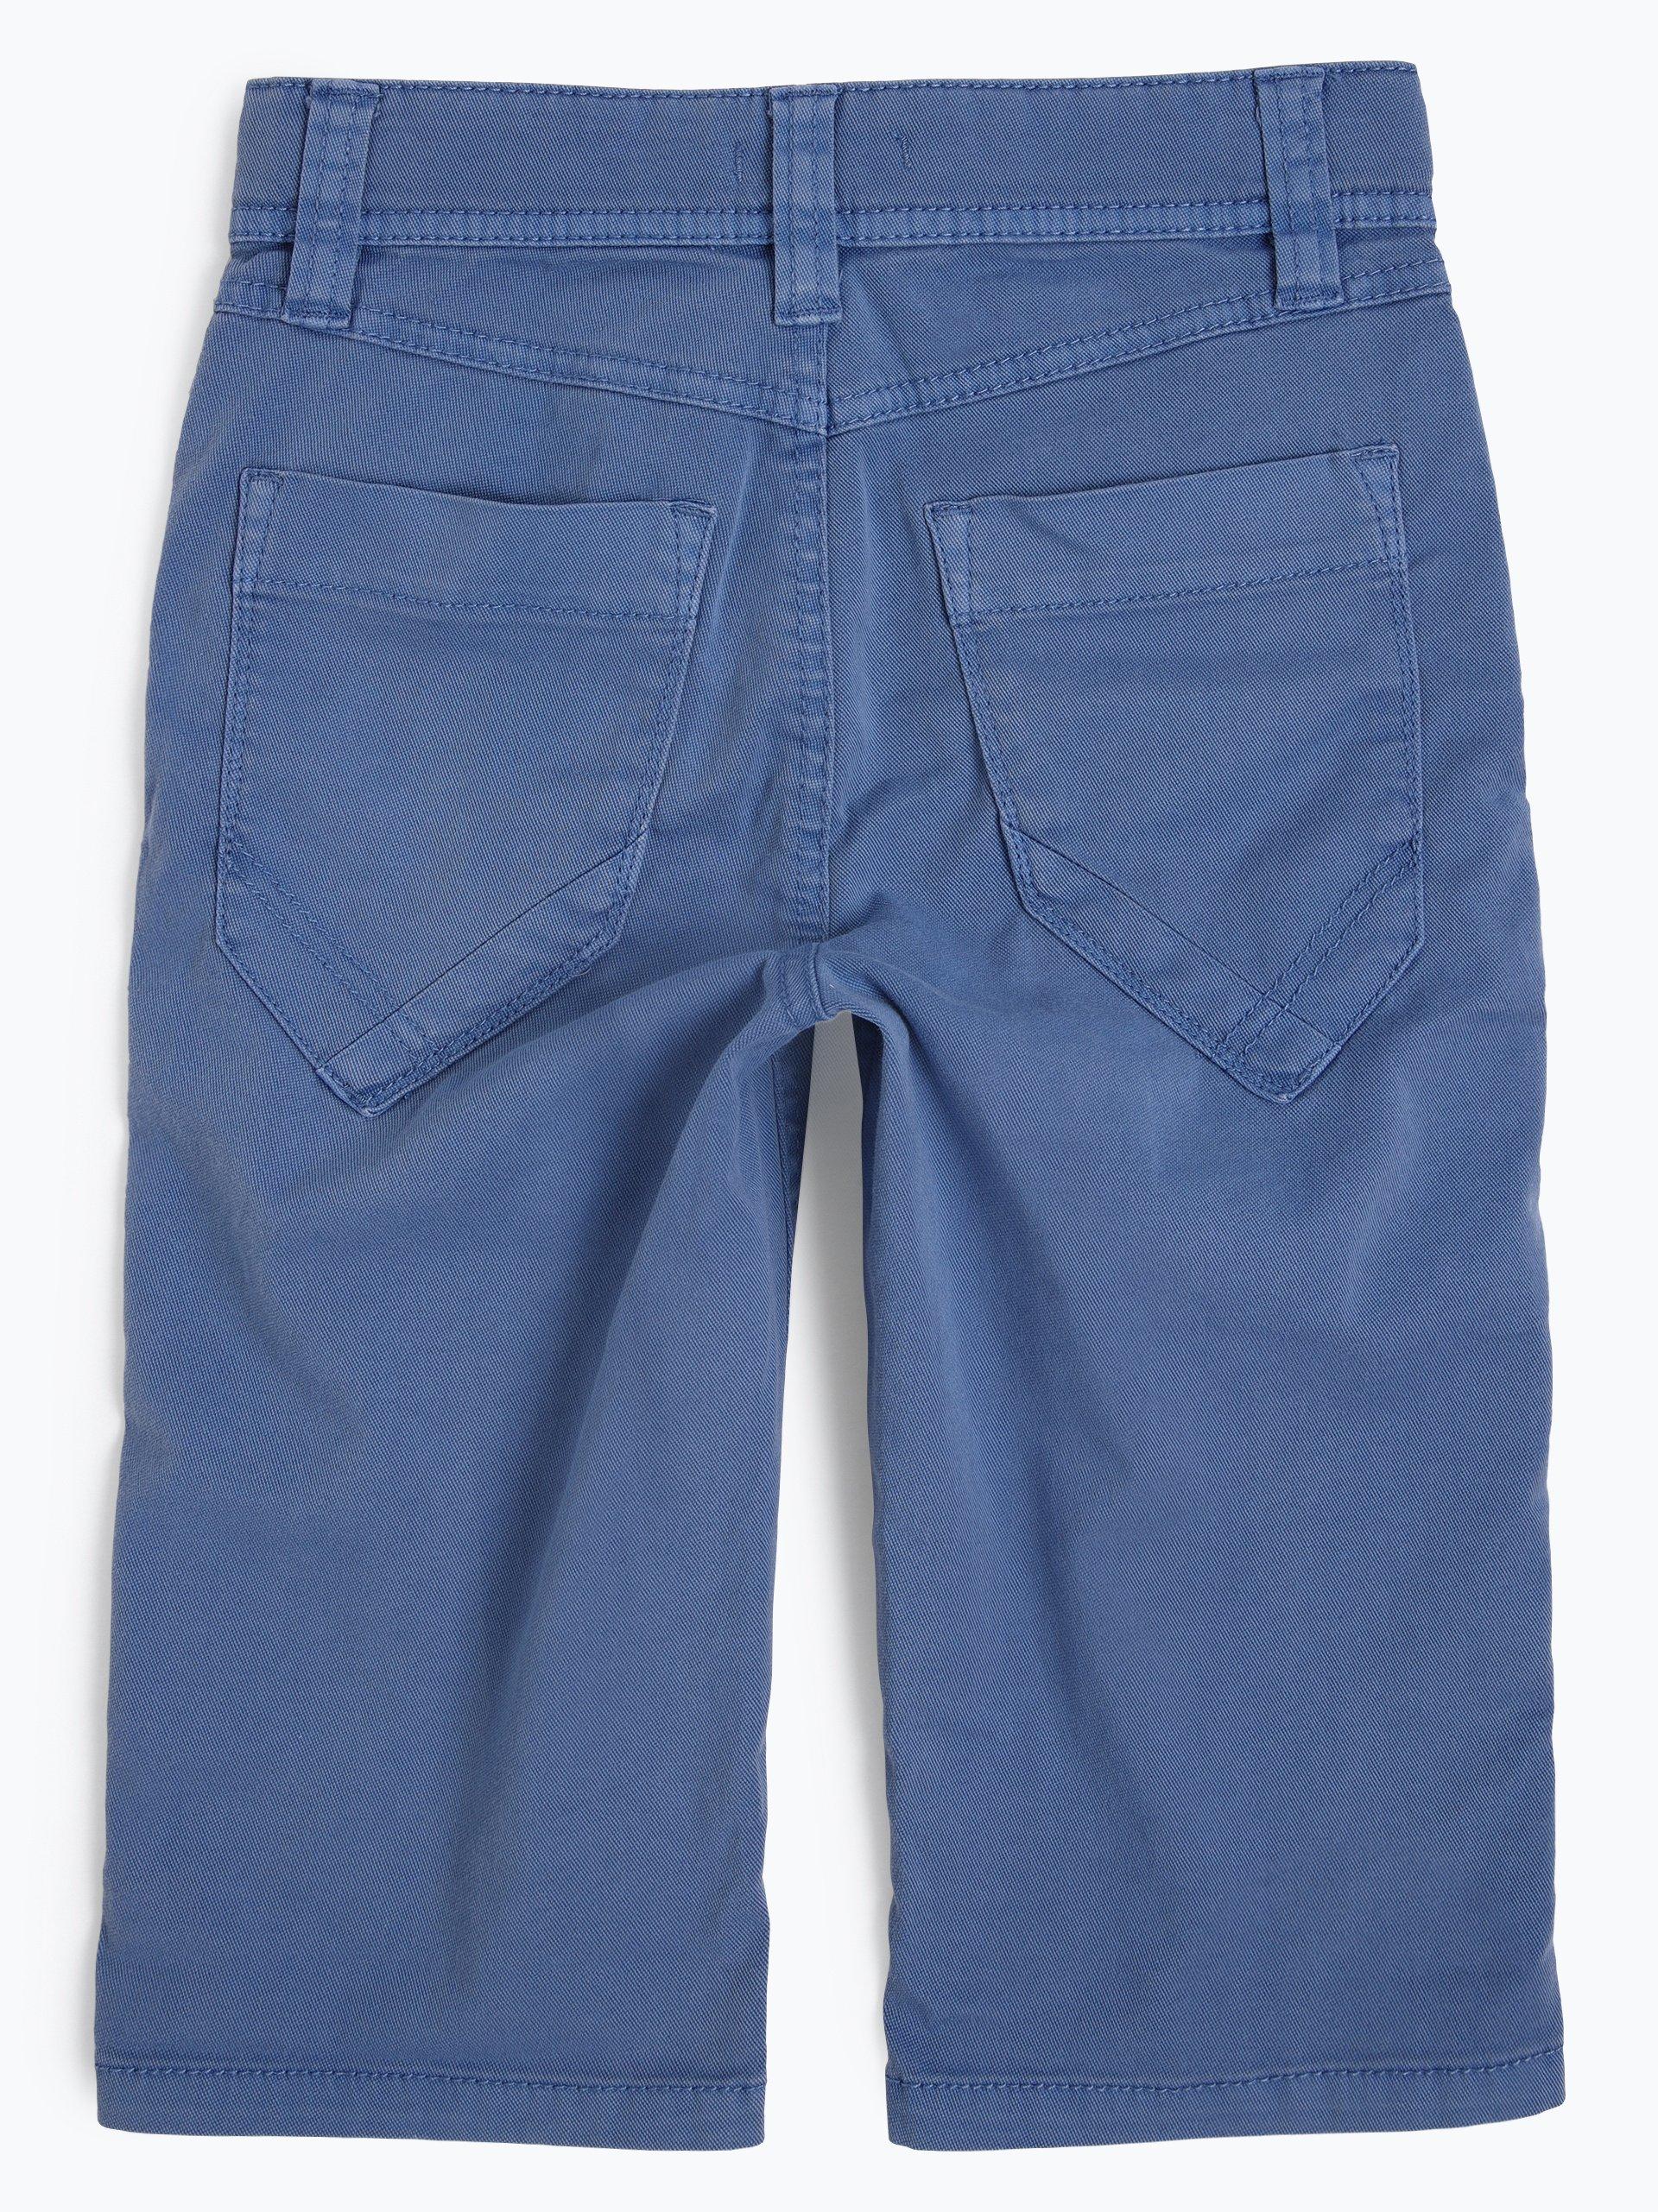 s.Oliver Casual Jungen Shorts - Slim Fit